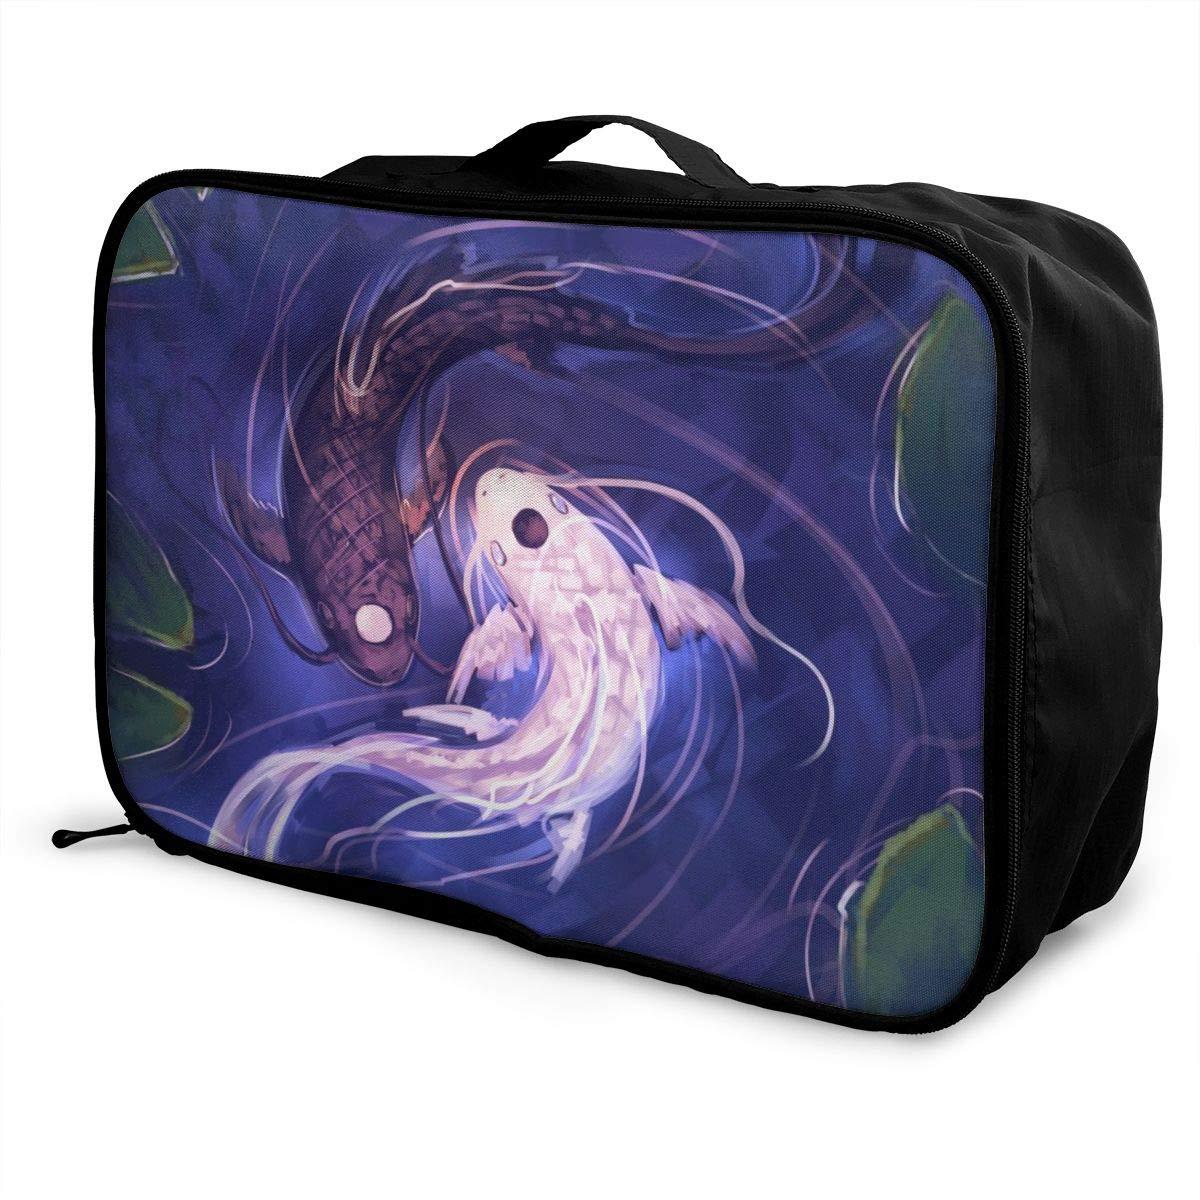 Interesting Yin Yang Fish Travel Storage Carry Luggage Duffle Tote Bag